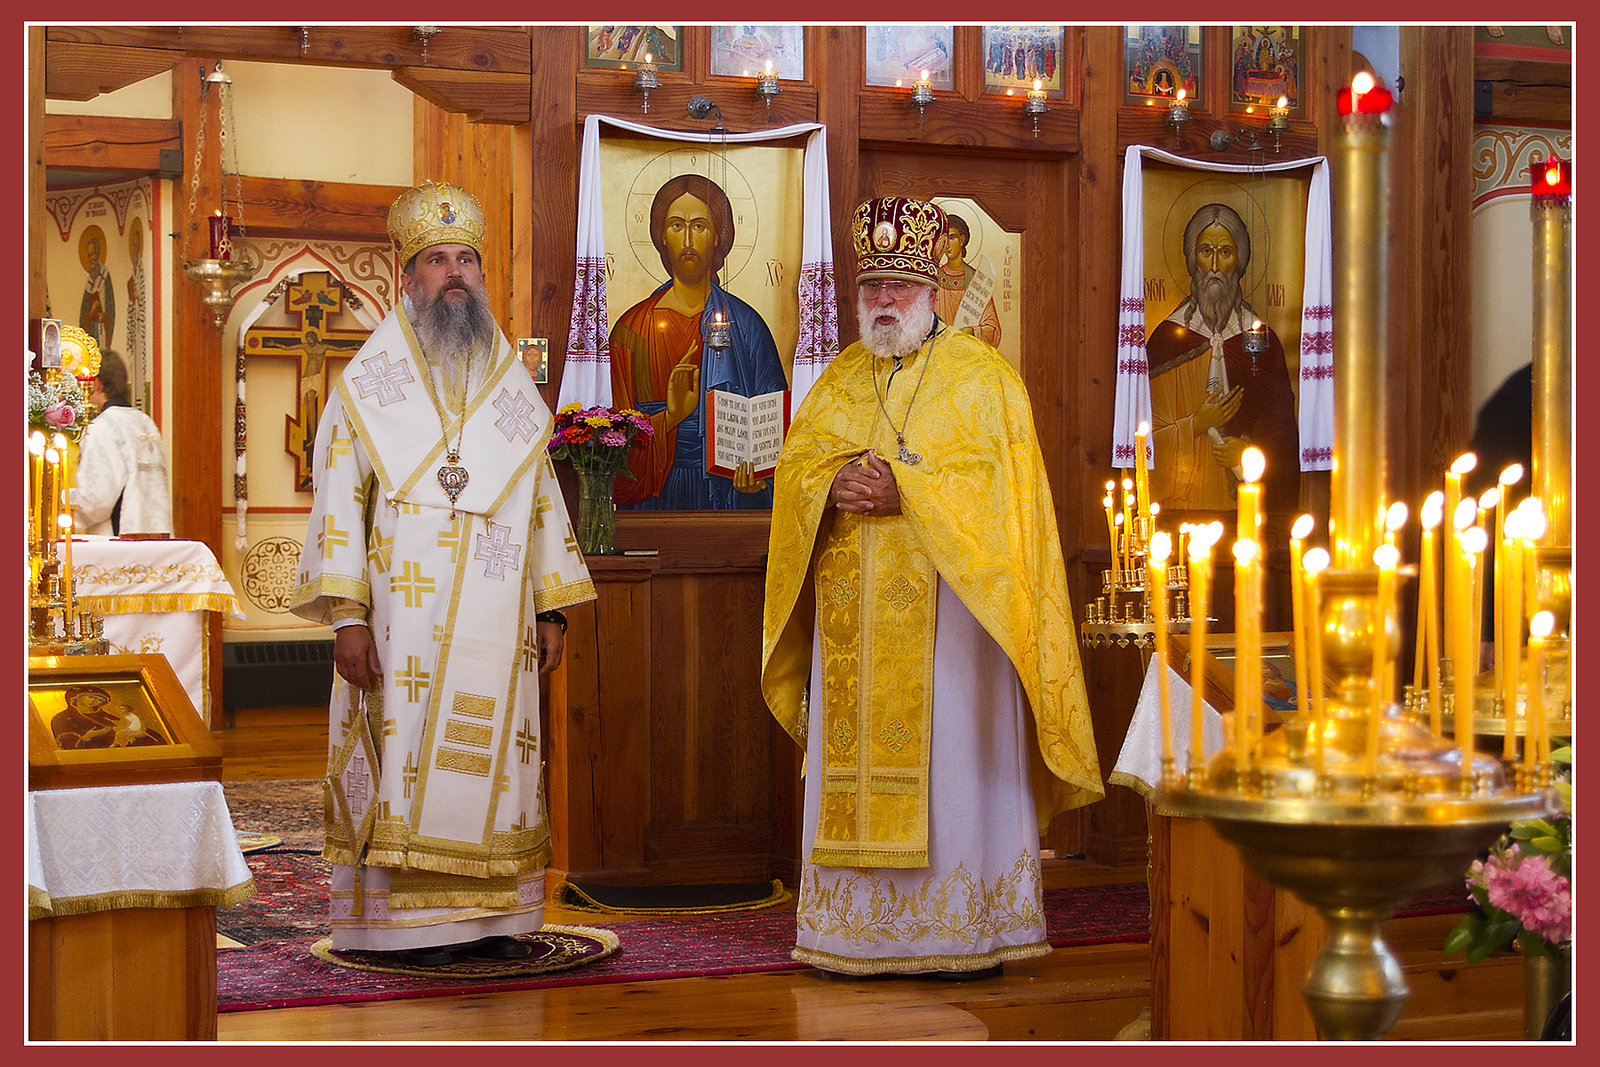 VIDEO: Bishop Benedykt of Lviv at St. Elias Church Ukrainian Catholic Church